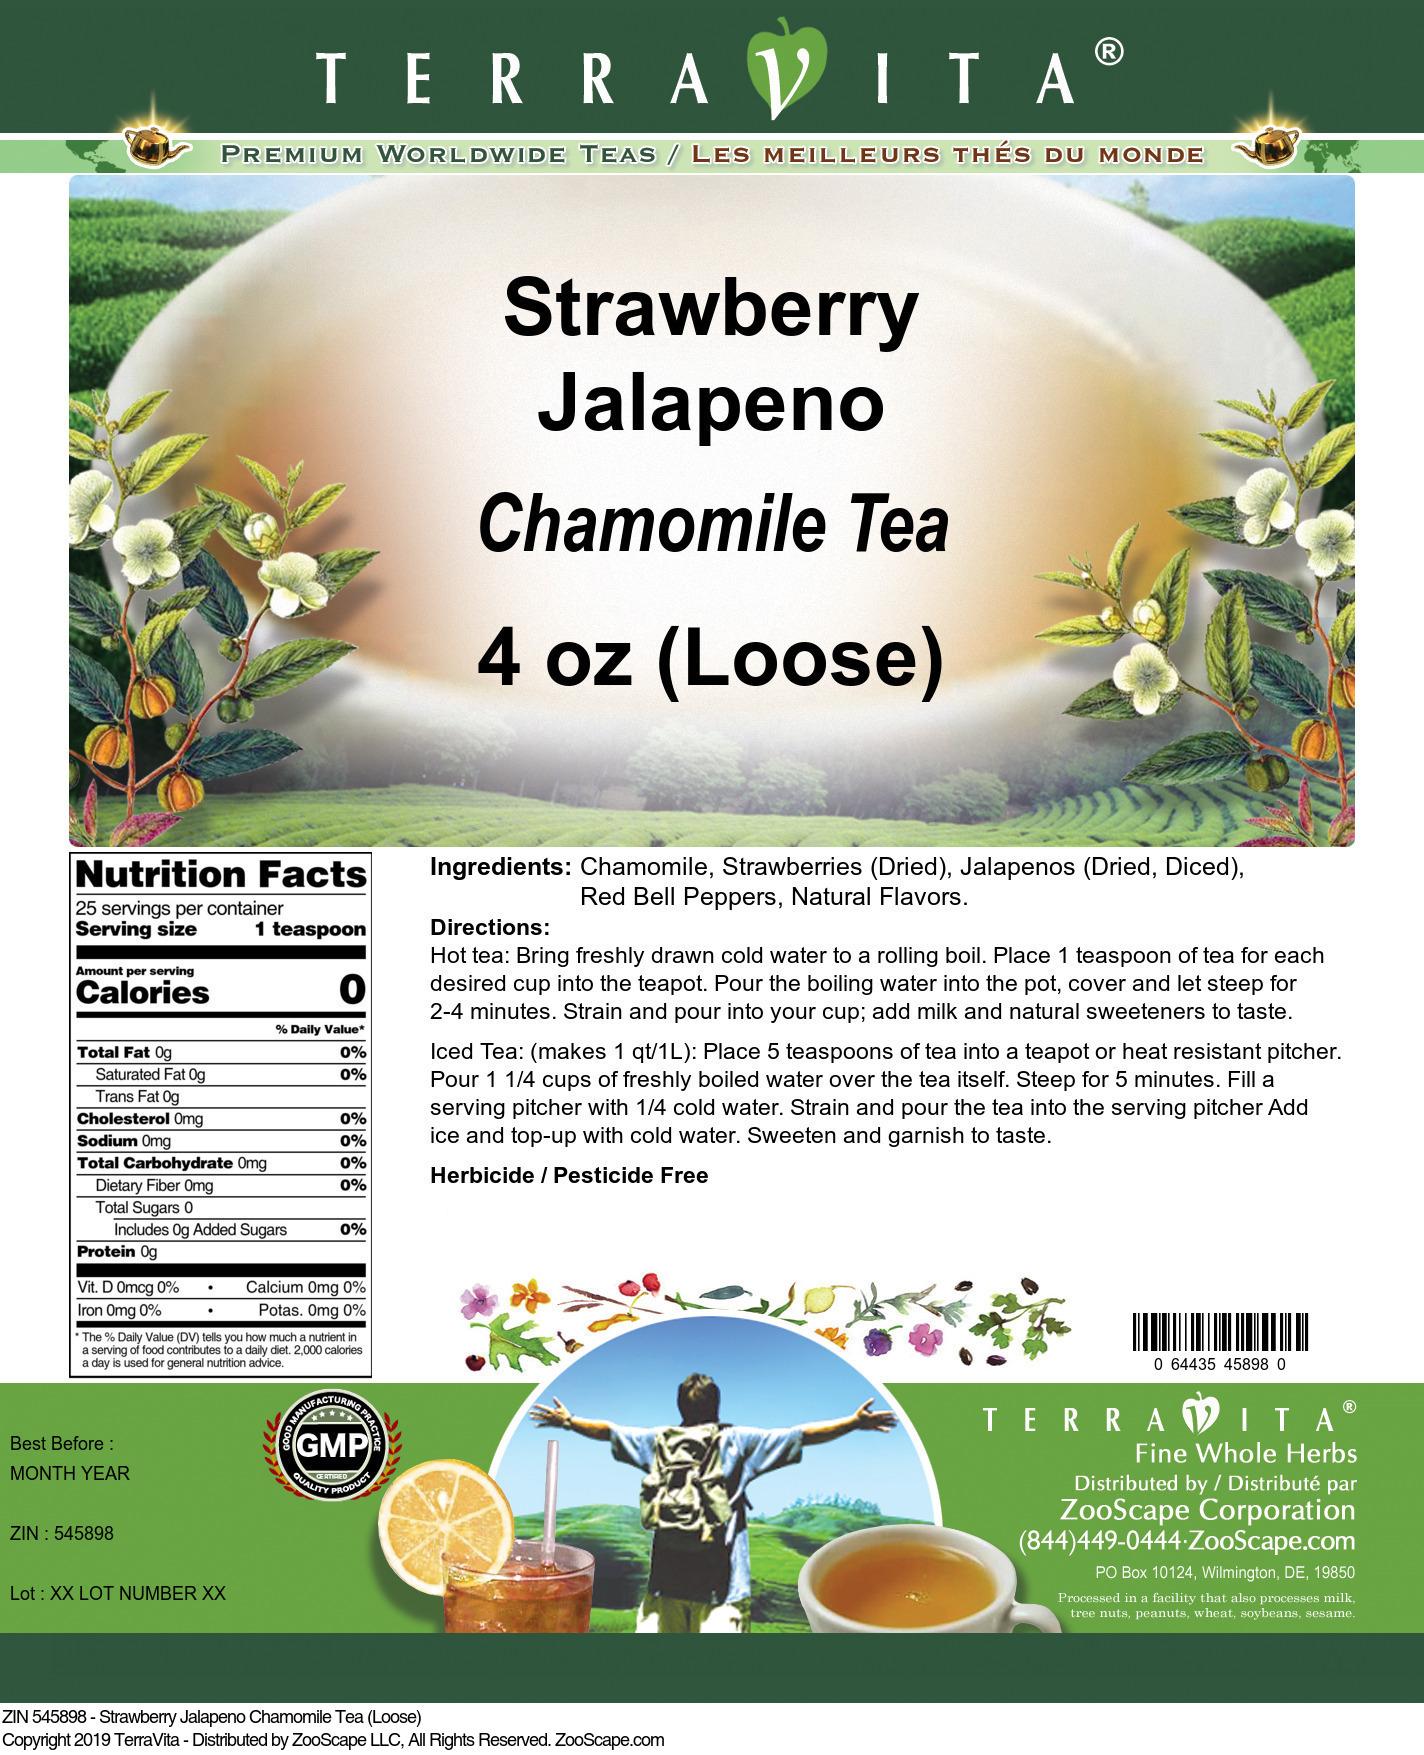 Strawberry Jalapeno Chamomile Tea (Loose)